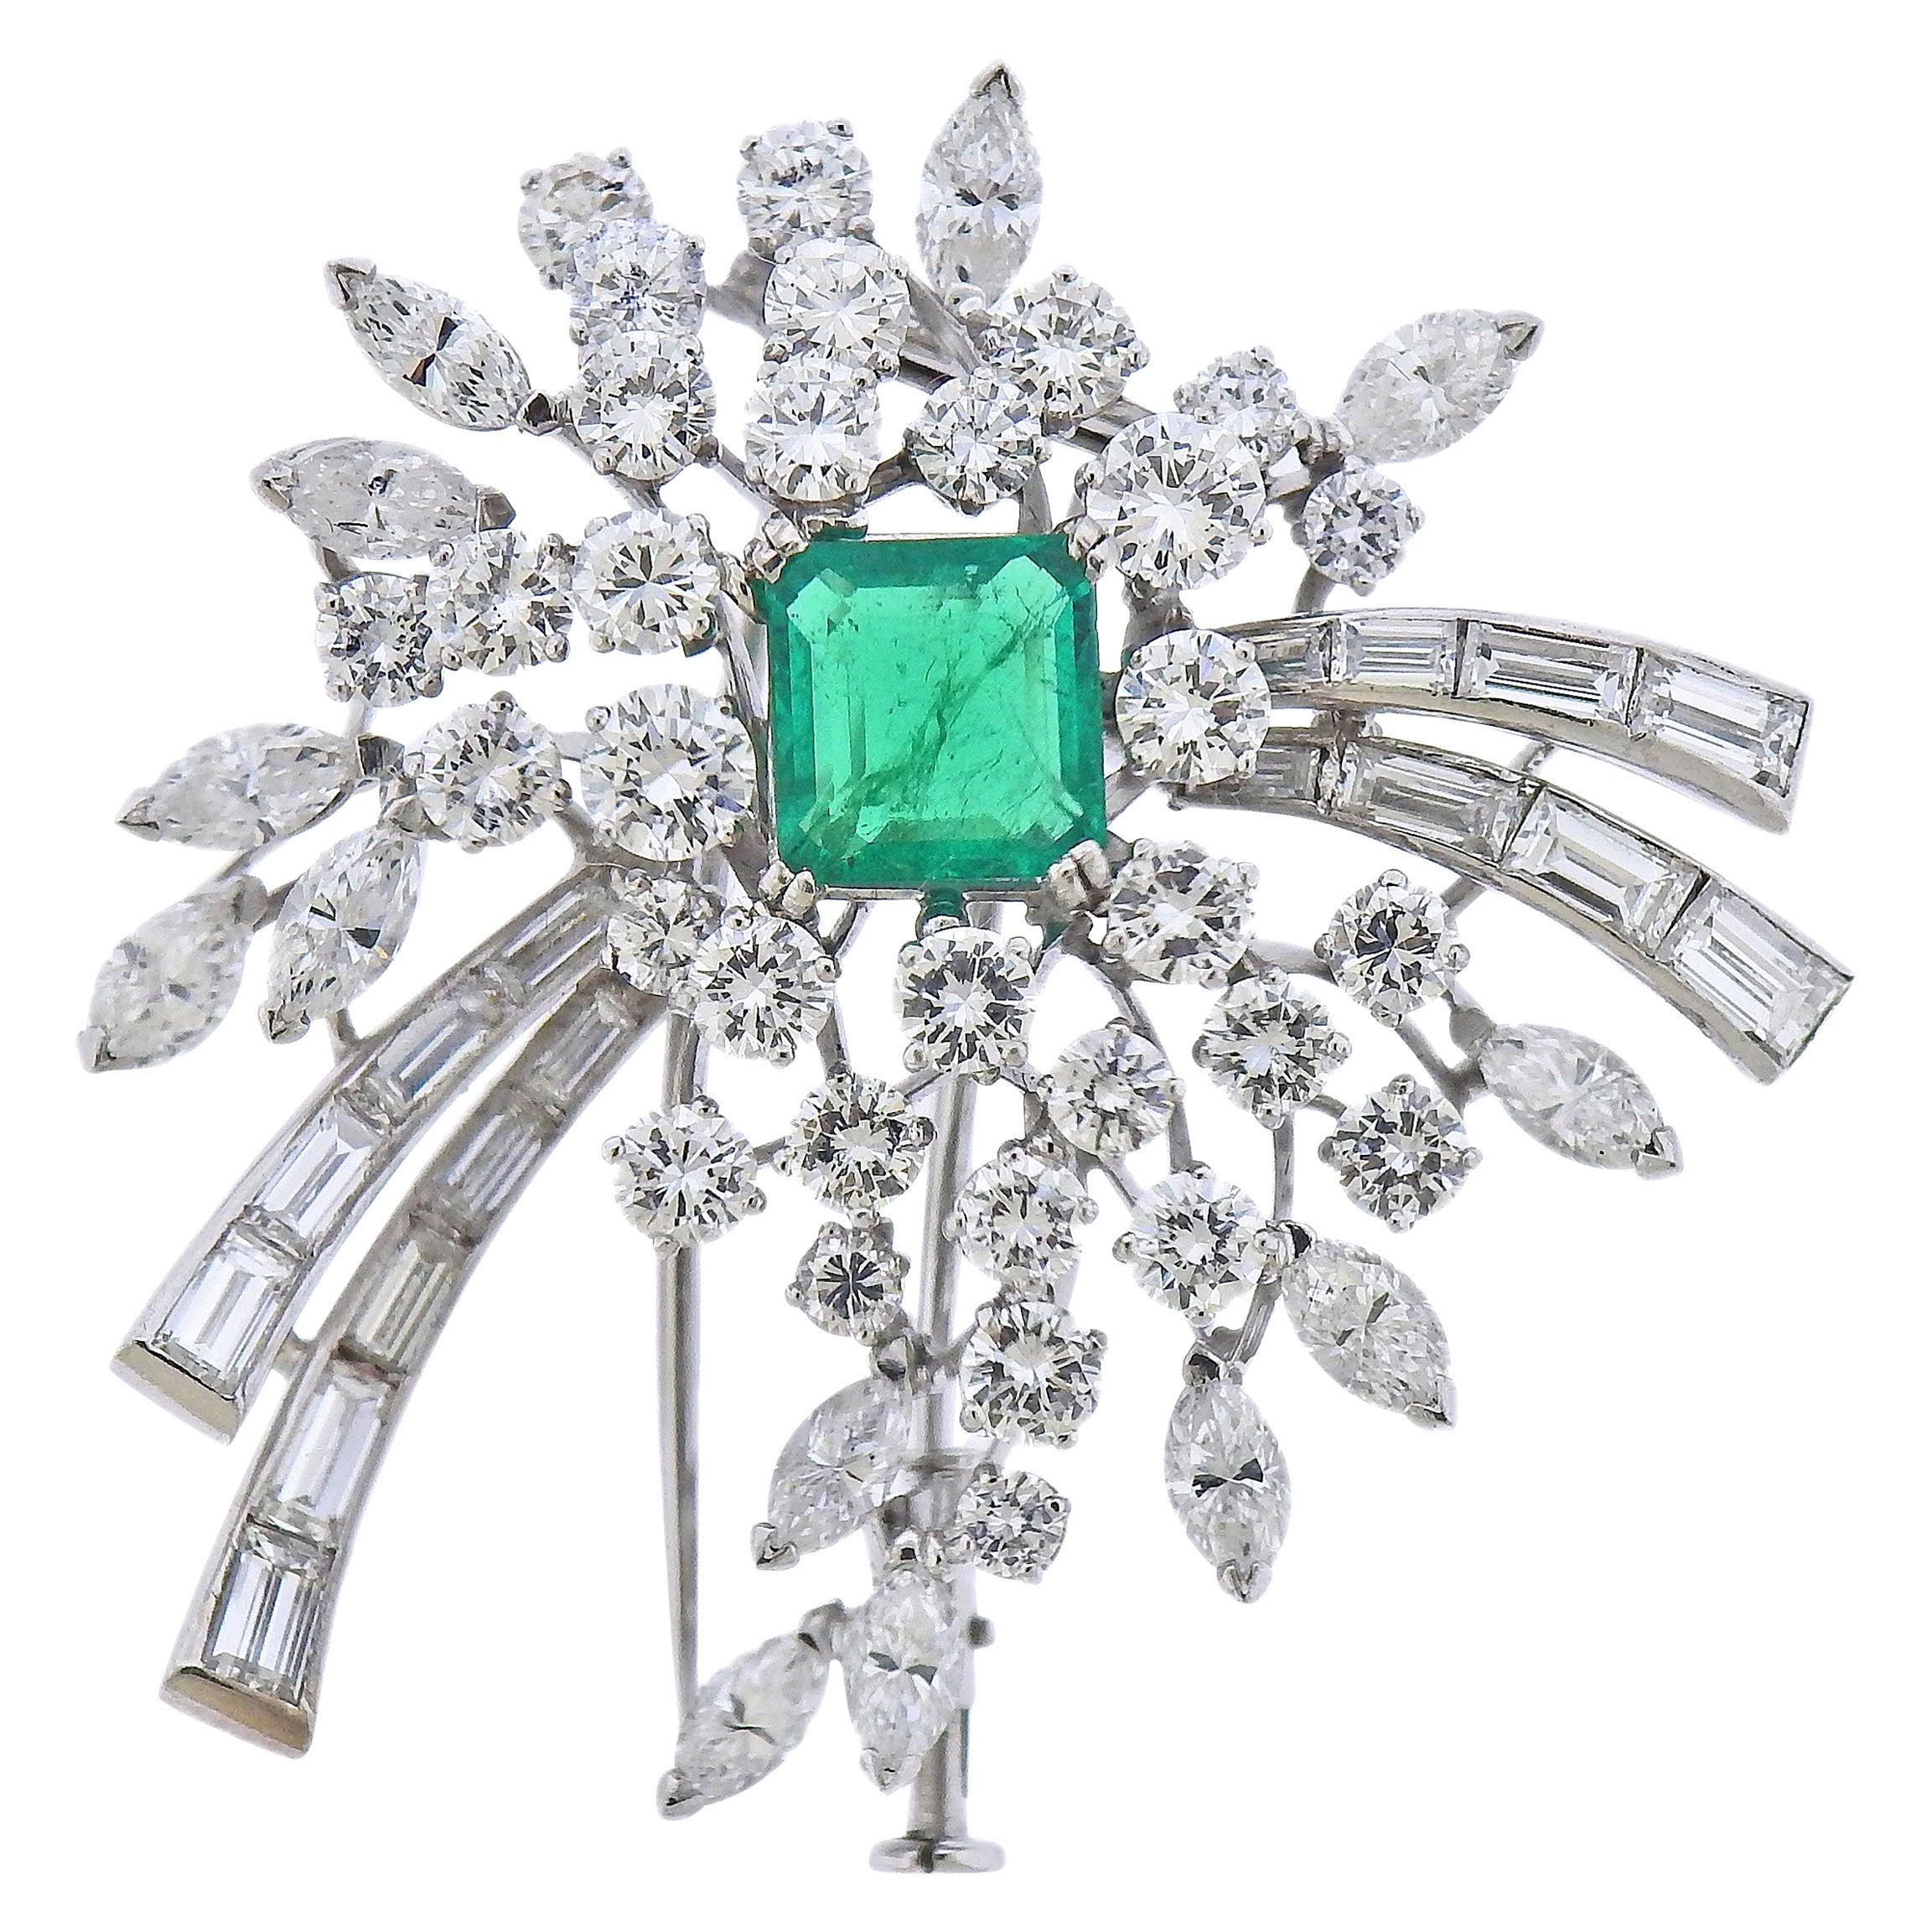 Italian Platinum Diamond Emerald Brooch